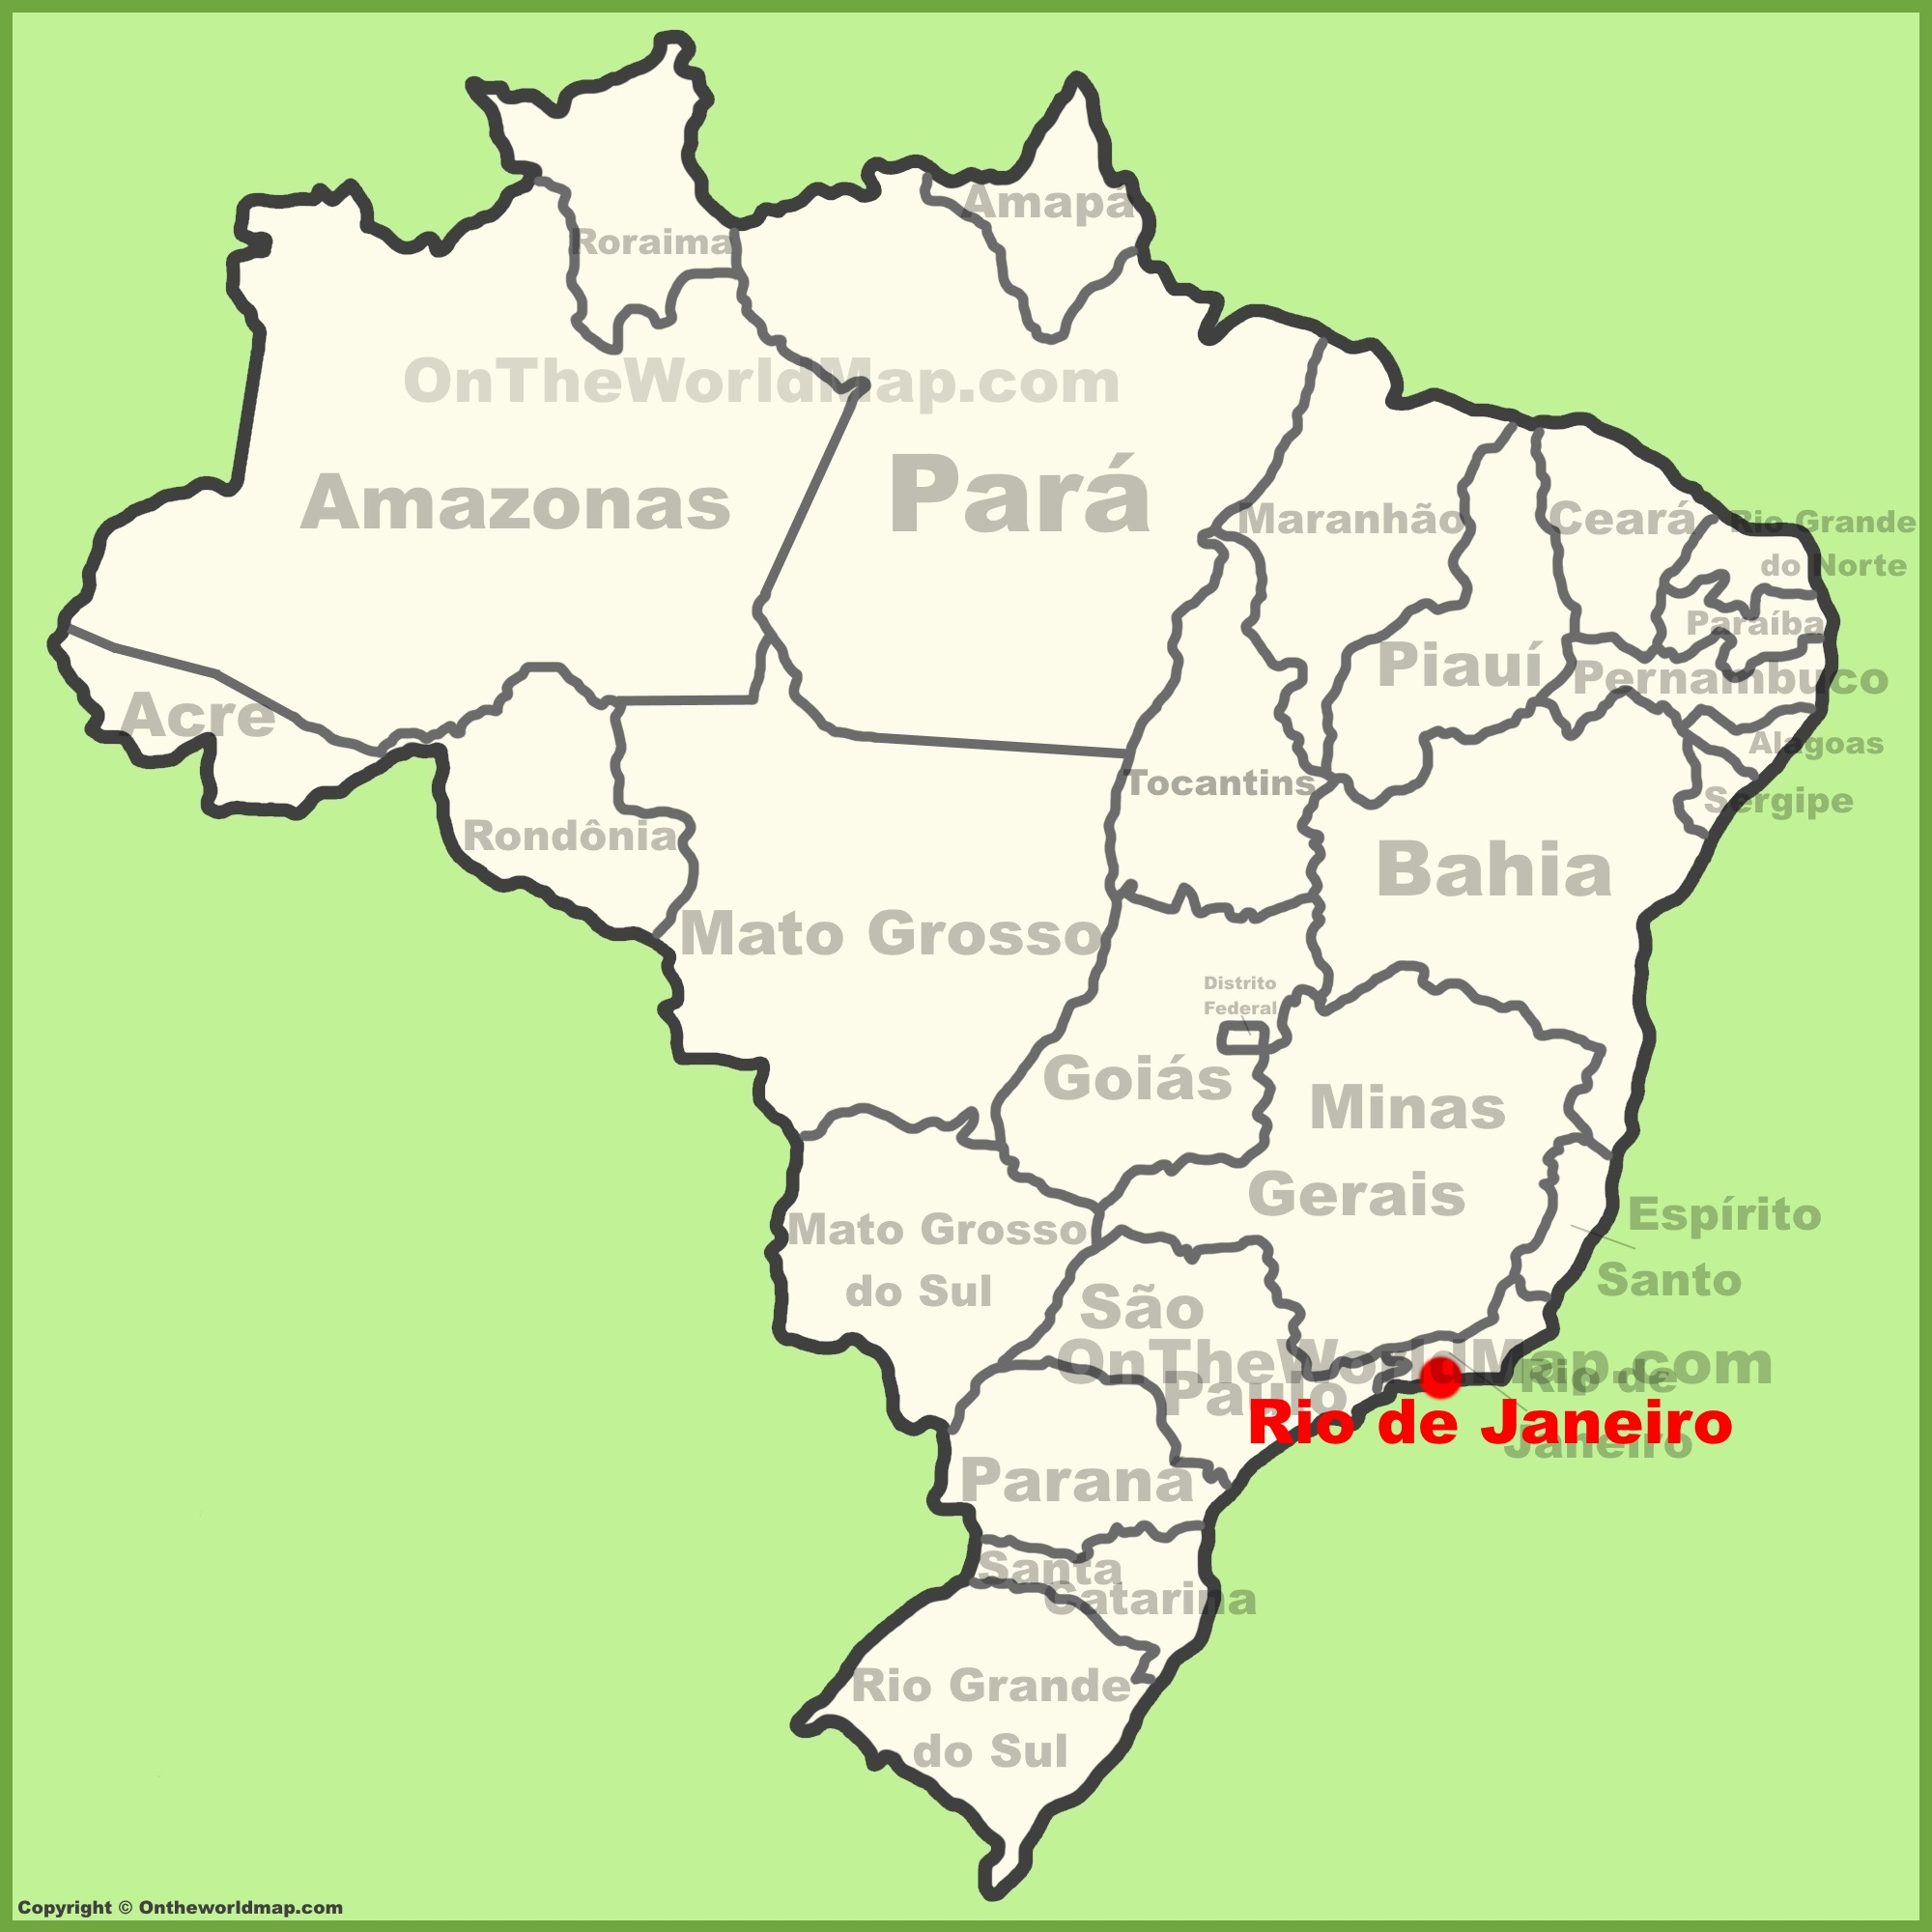 Rio de Janeiro location on the Brazil map